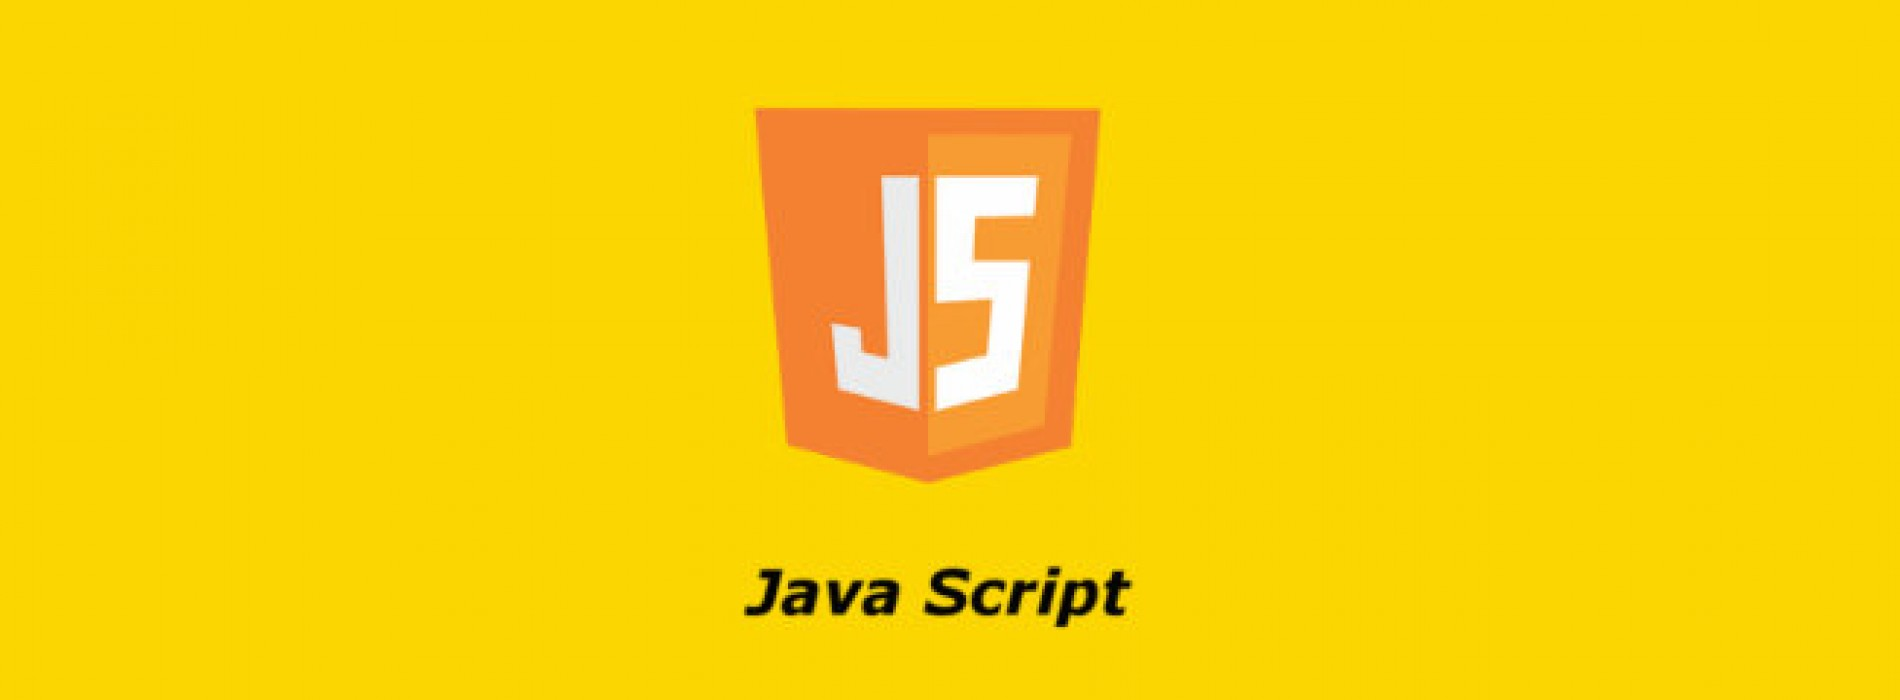 My favorite JavaScript libraries